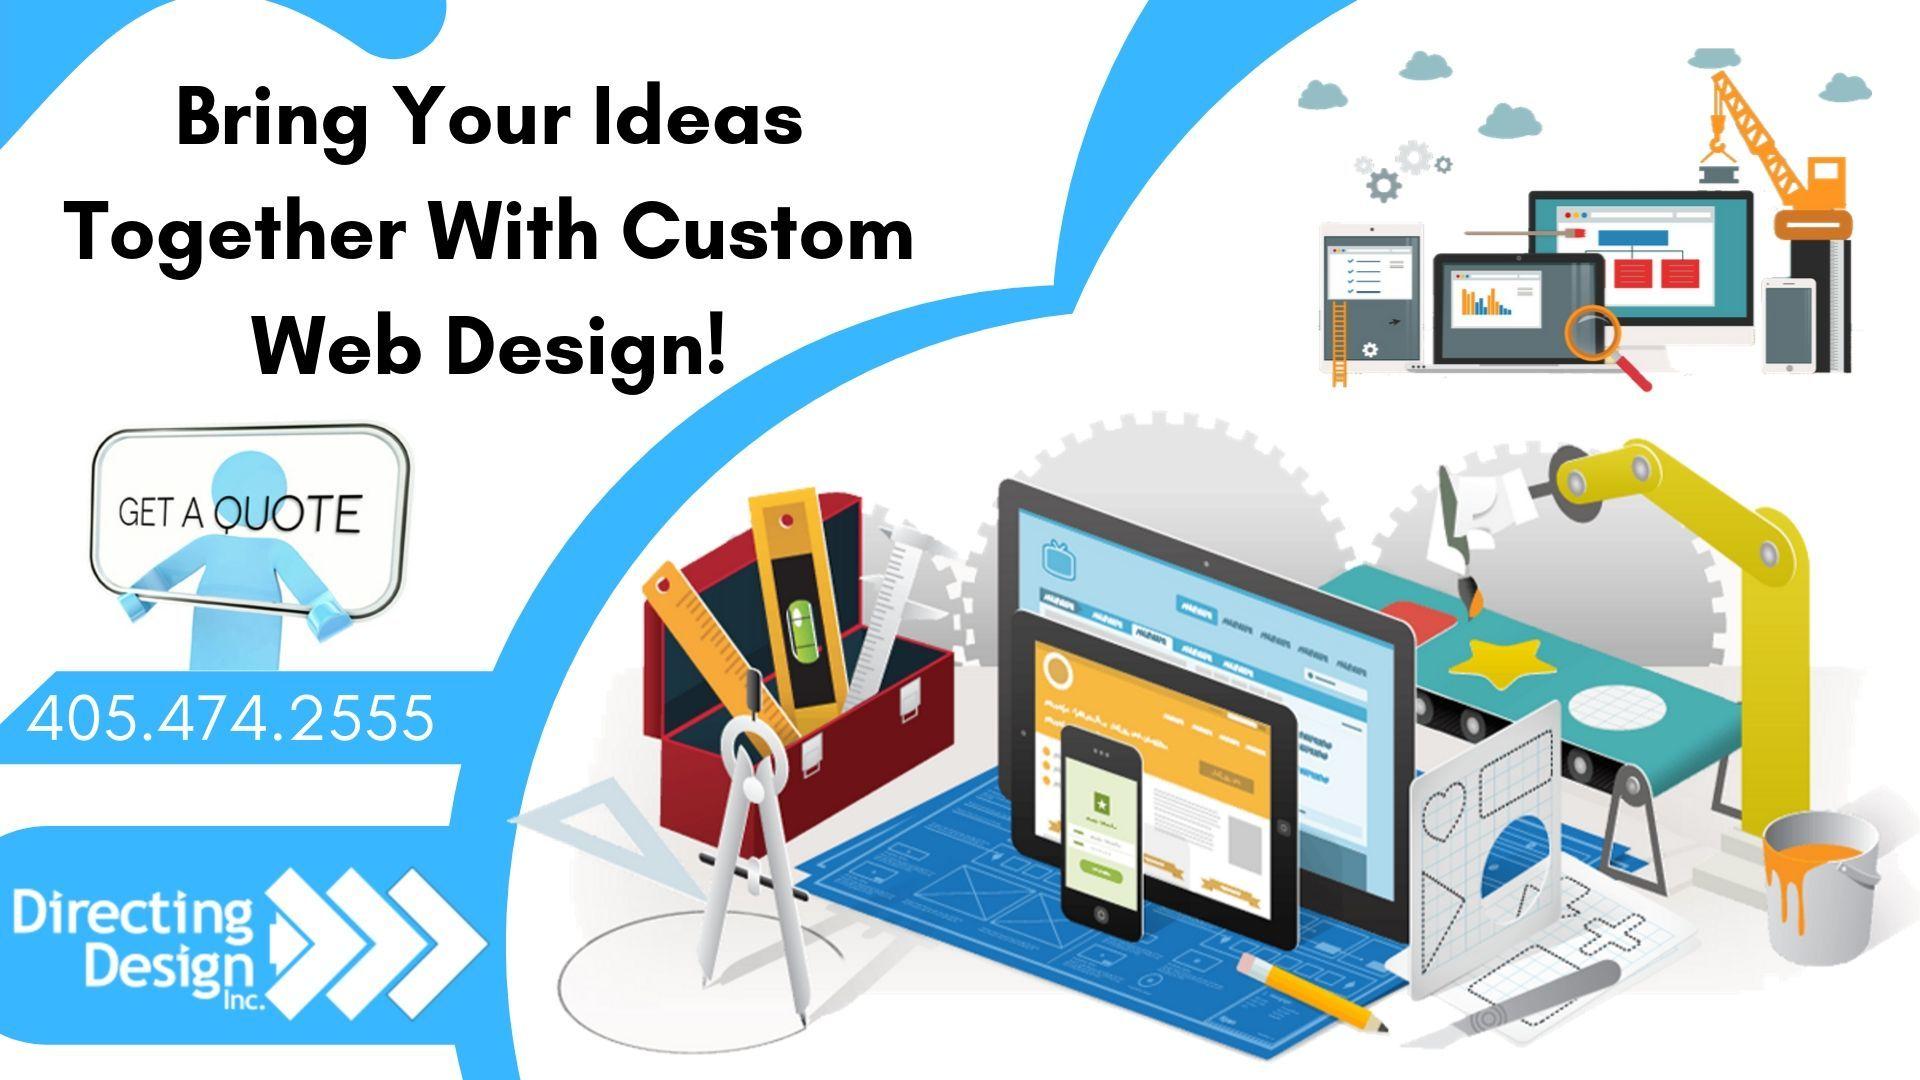 Directing Design Responsive Websites Web Development Company Web Design Agency Web Design Company